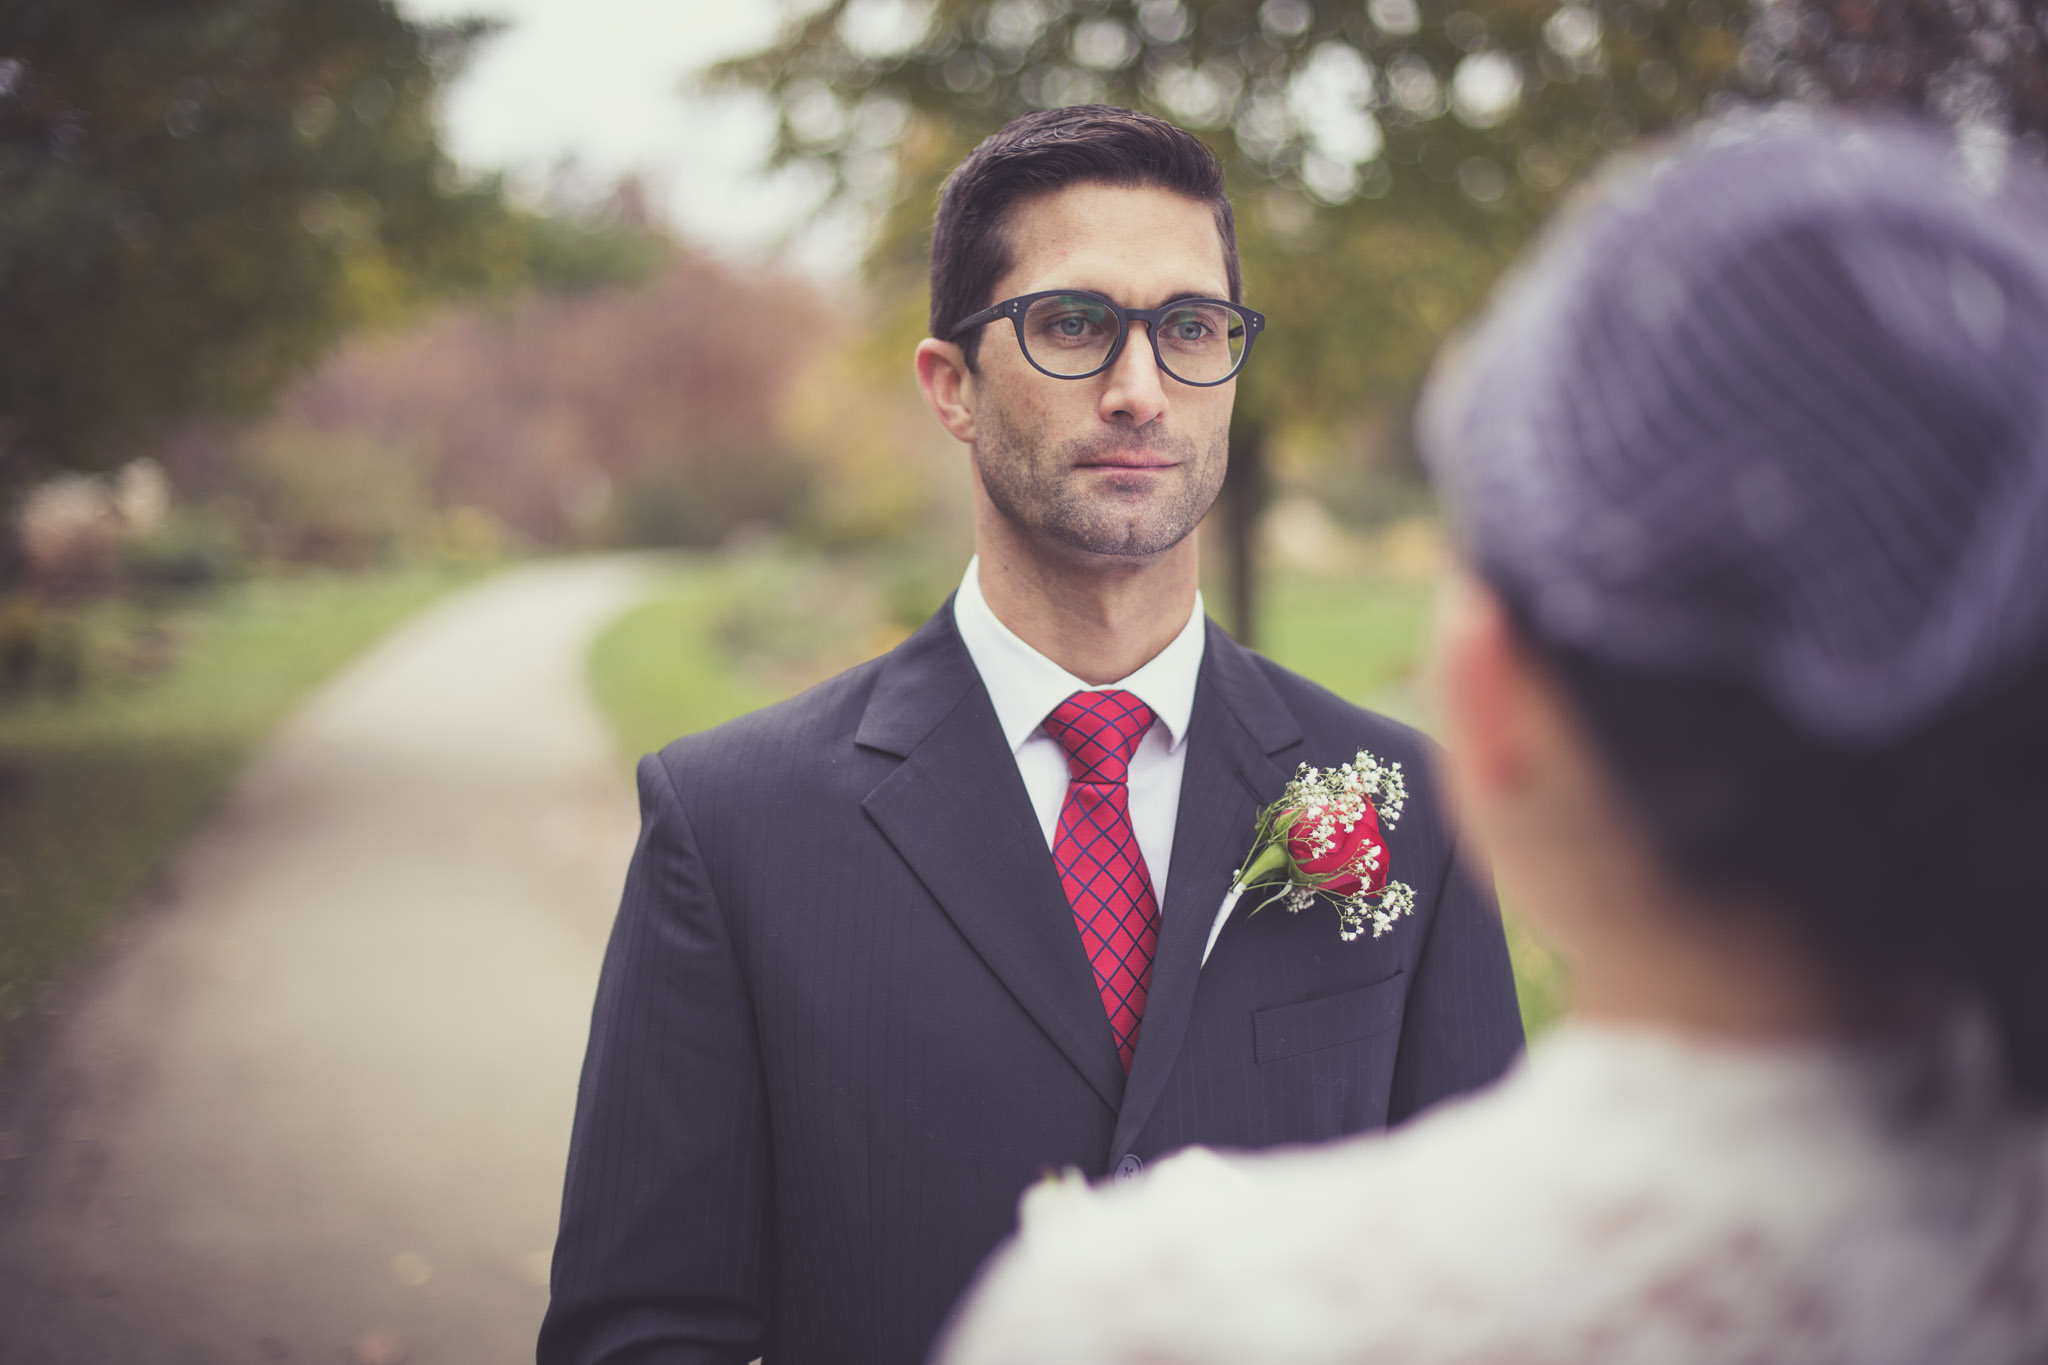 Geovanna-JP-wedding-shayne-gray-web-0827.jpg